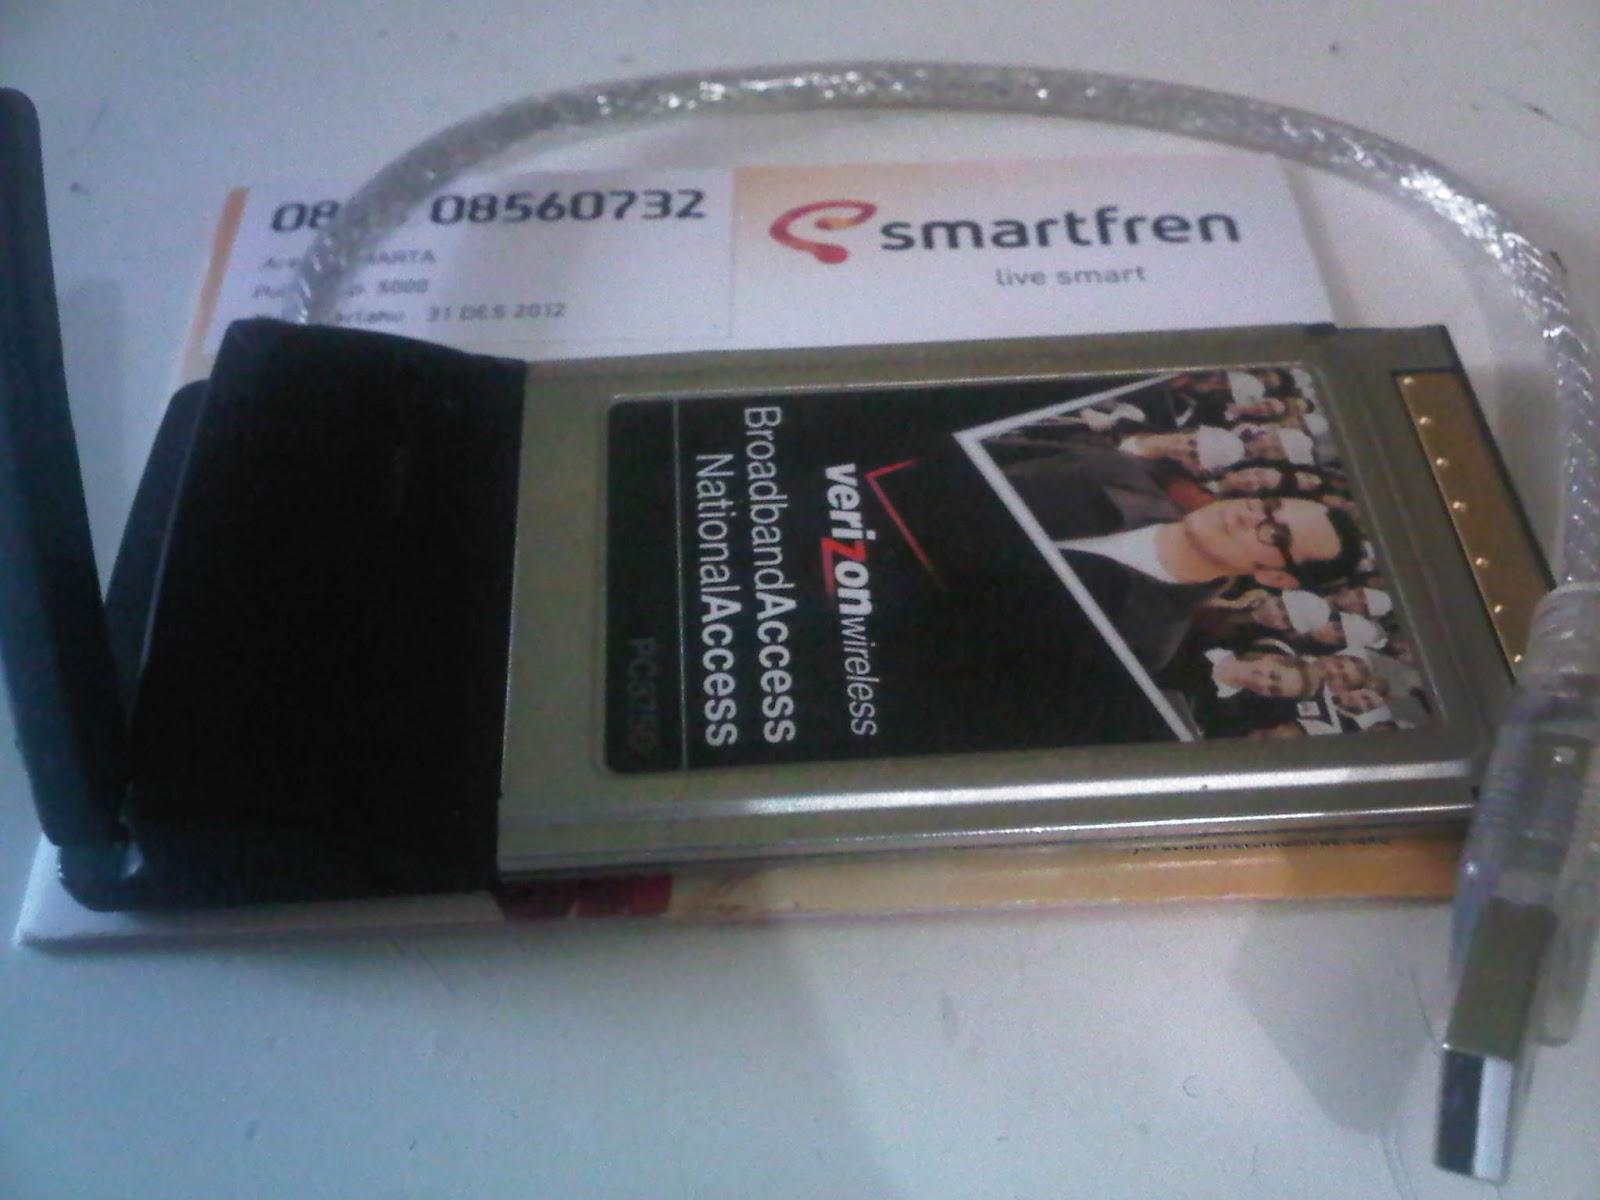 Panasonic toughbook verizon pc5750 pcmcia broadband national.